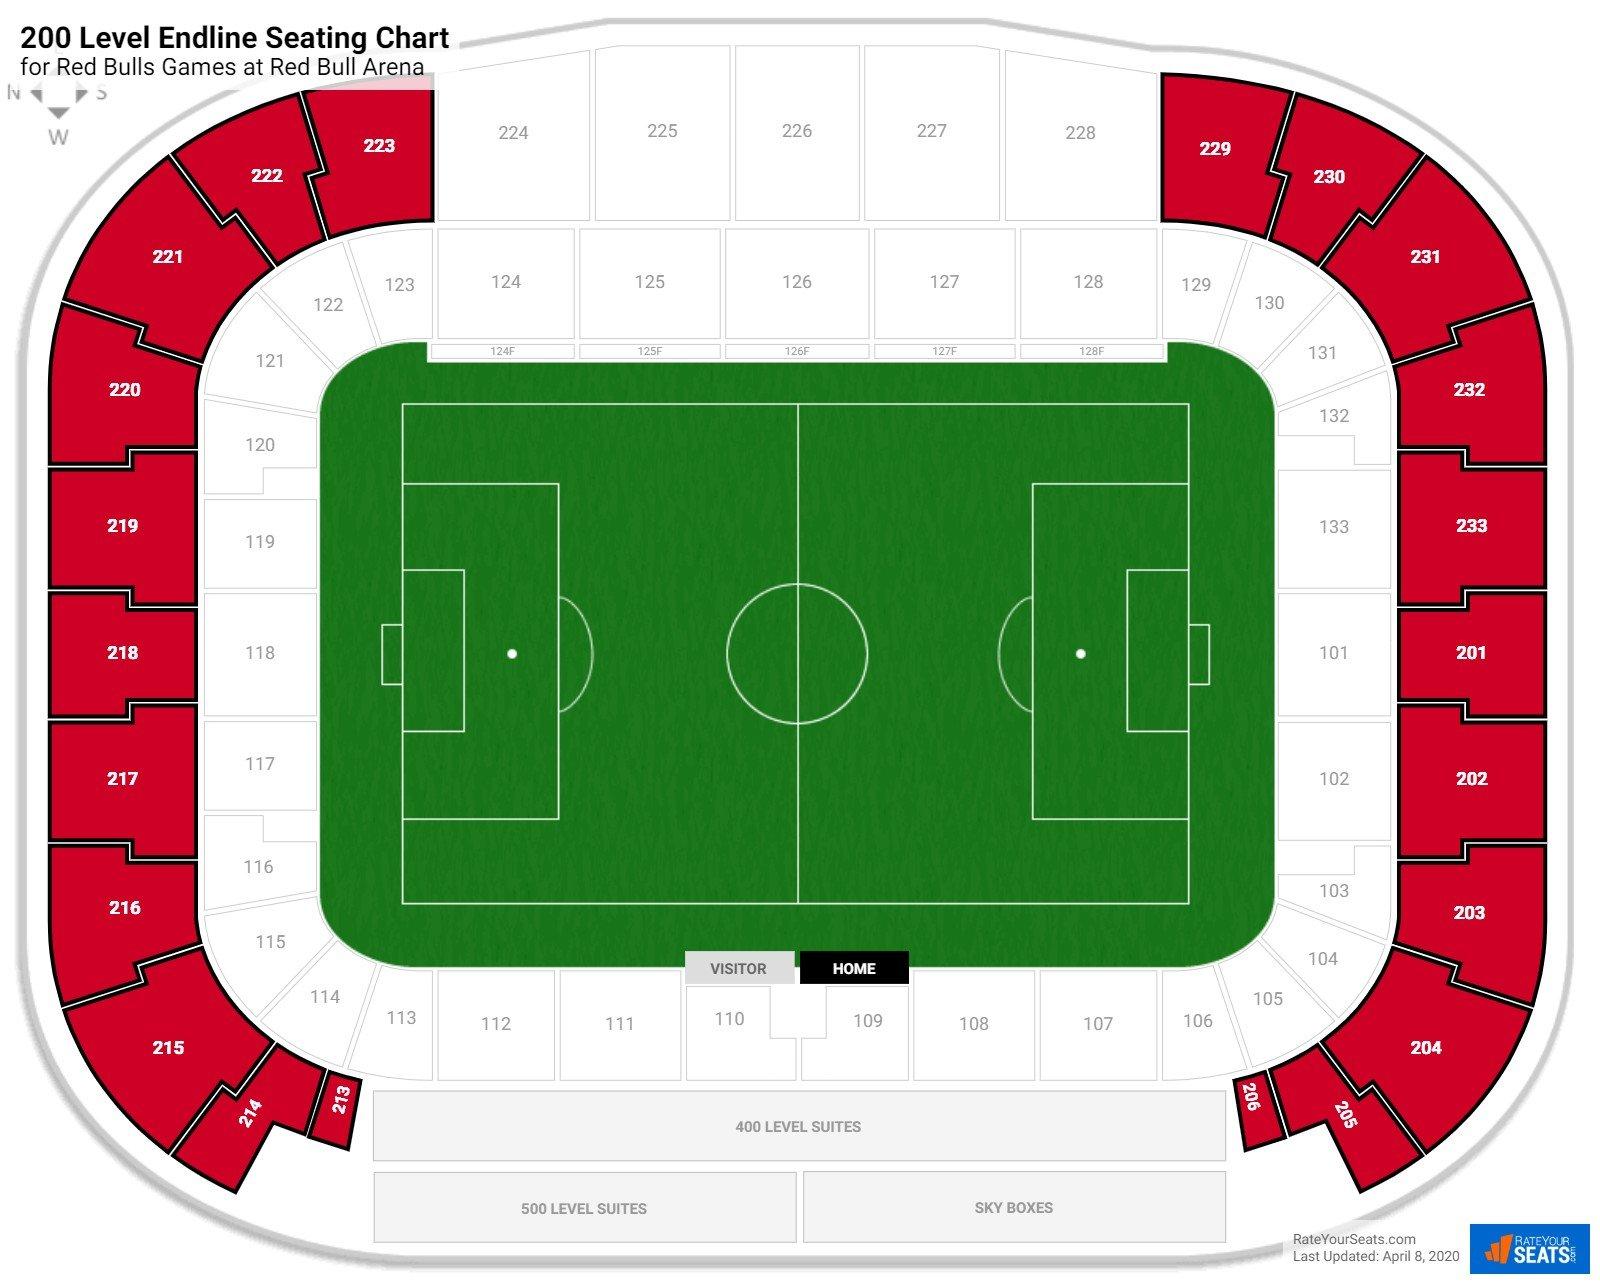 Red Bull Arena 200 Level Endline Seating Chart